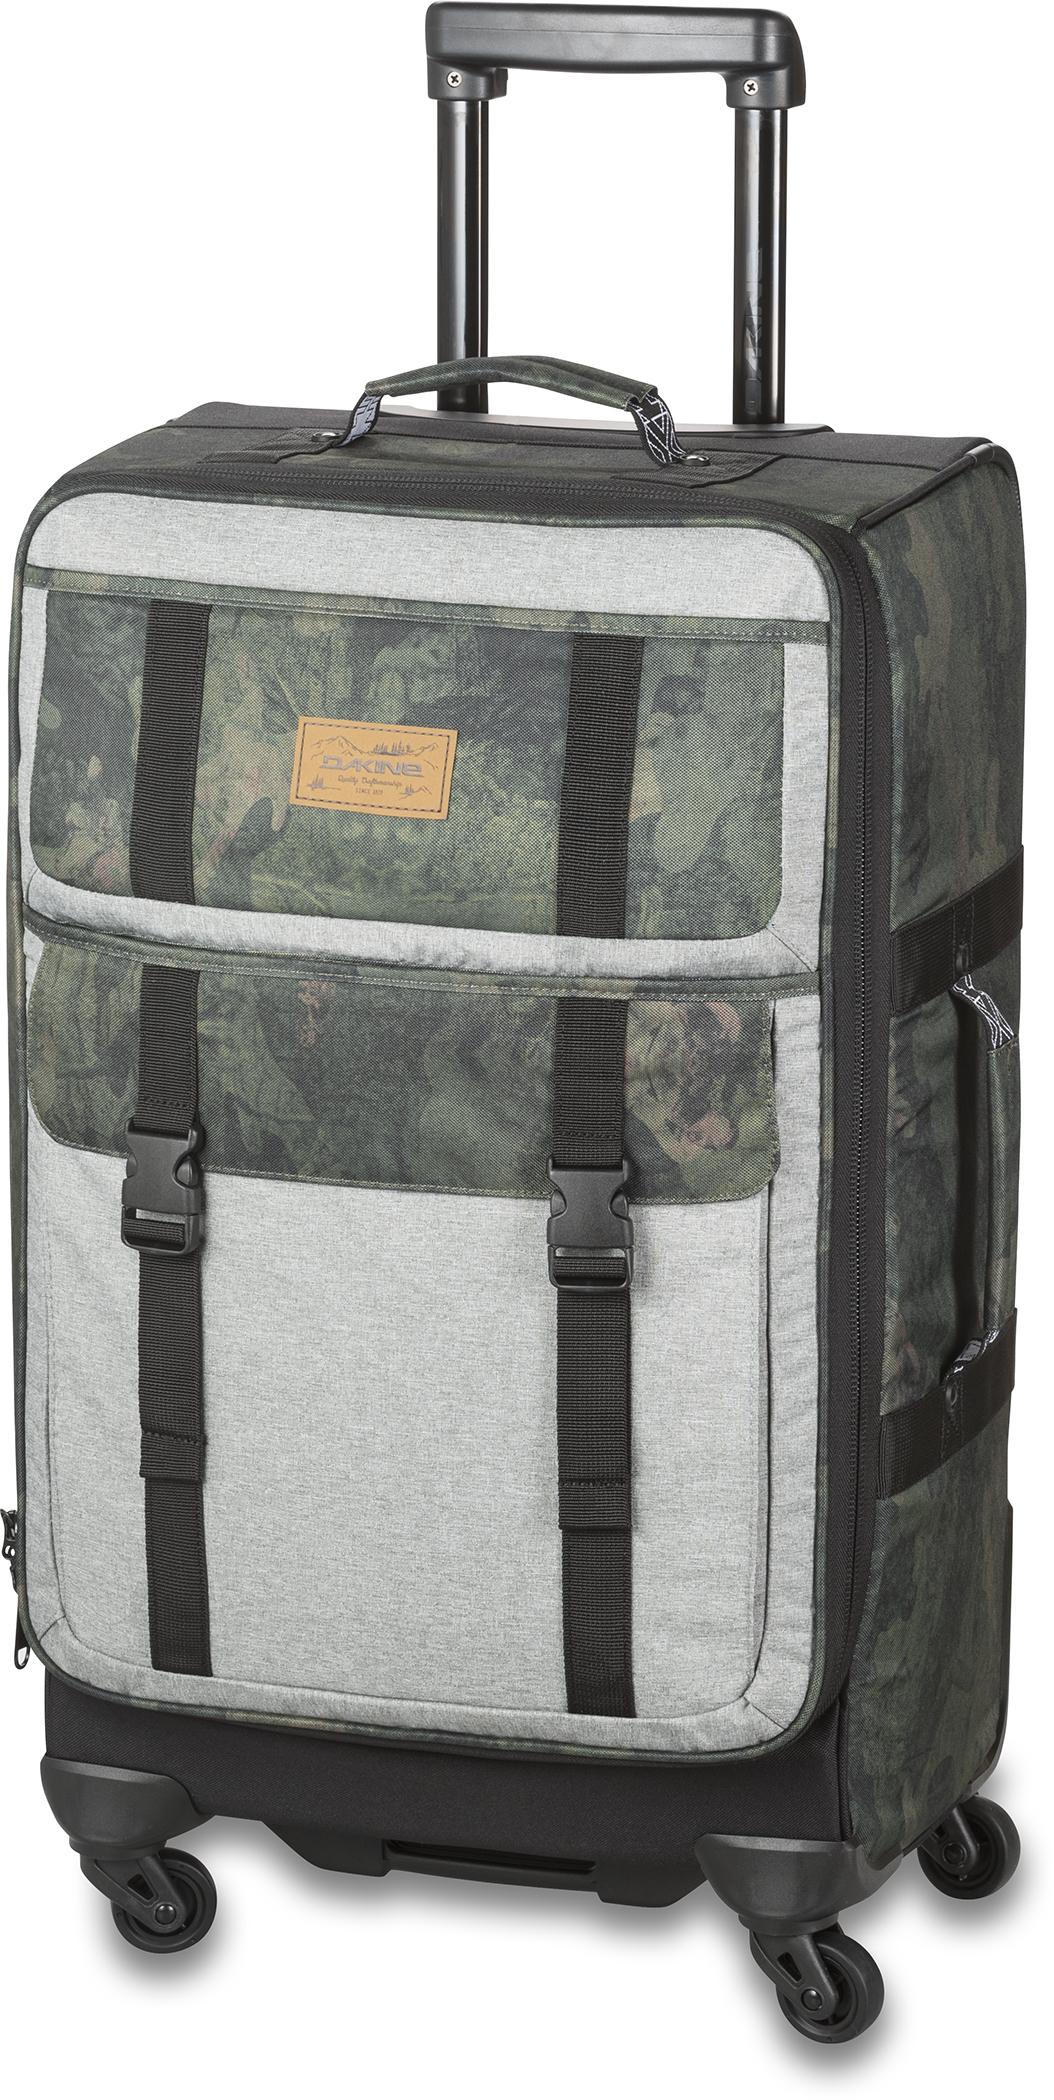 Dakine Cruiser Roller 65L Suitcase Travel Bag 2016 Glisan